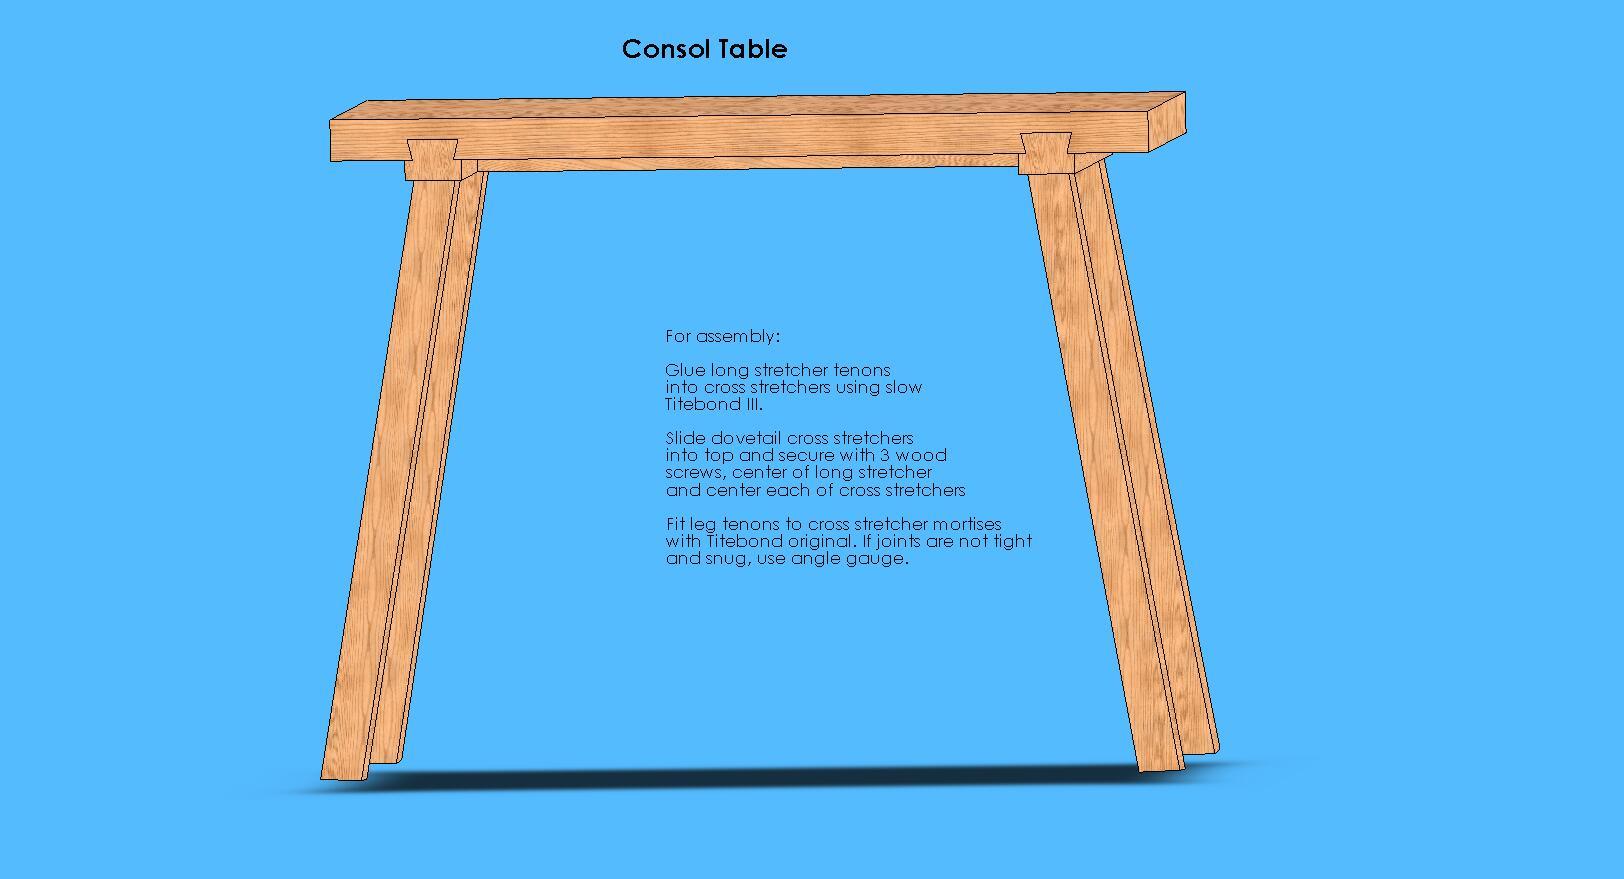 consol table.jpg